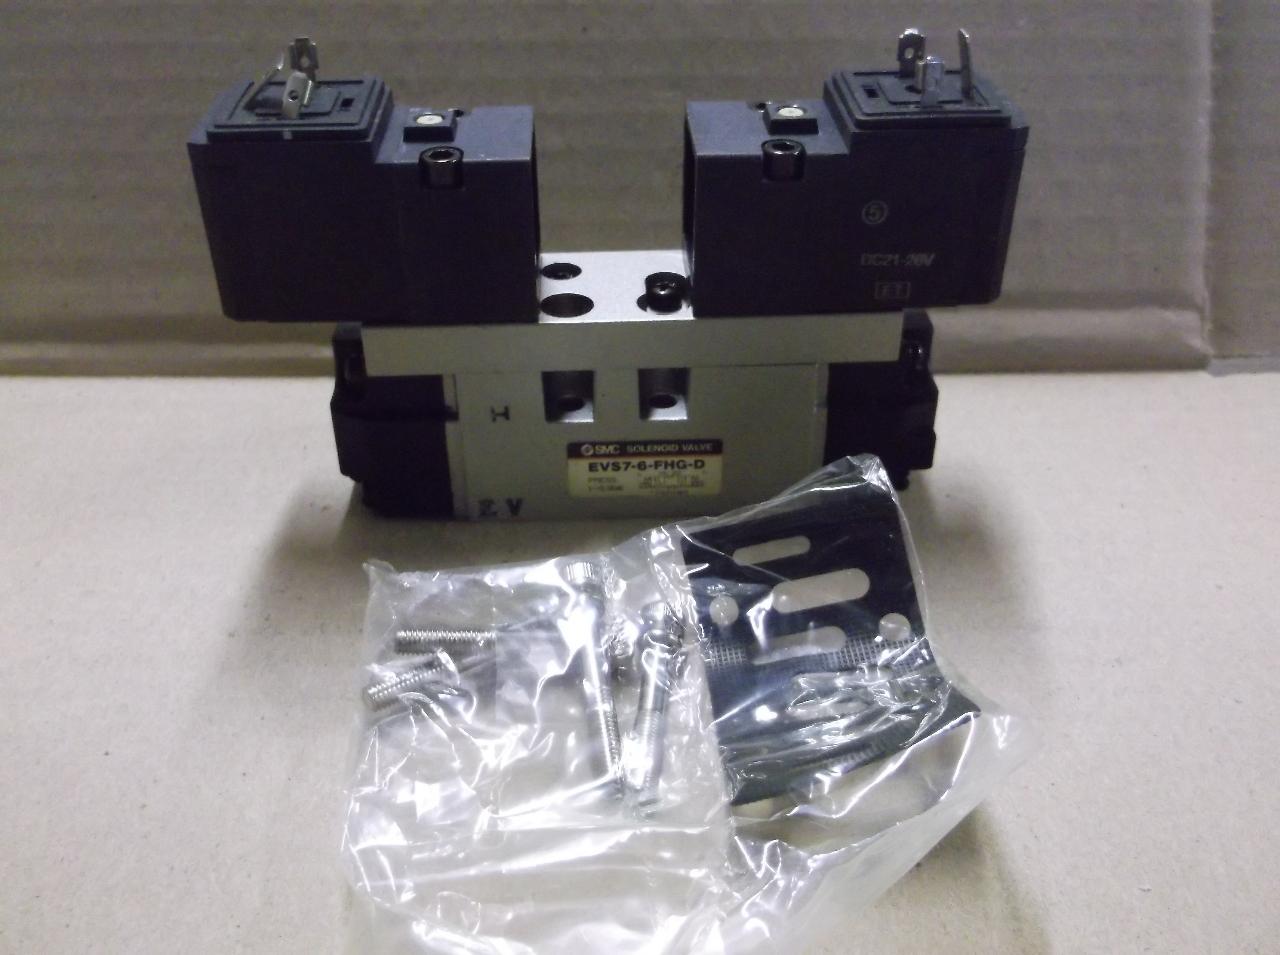 Smc Evs7 6 Fhg D Solenoid Single Valve Iso 1 9 9 Bar W